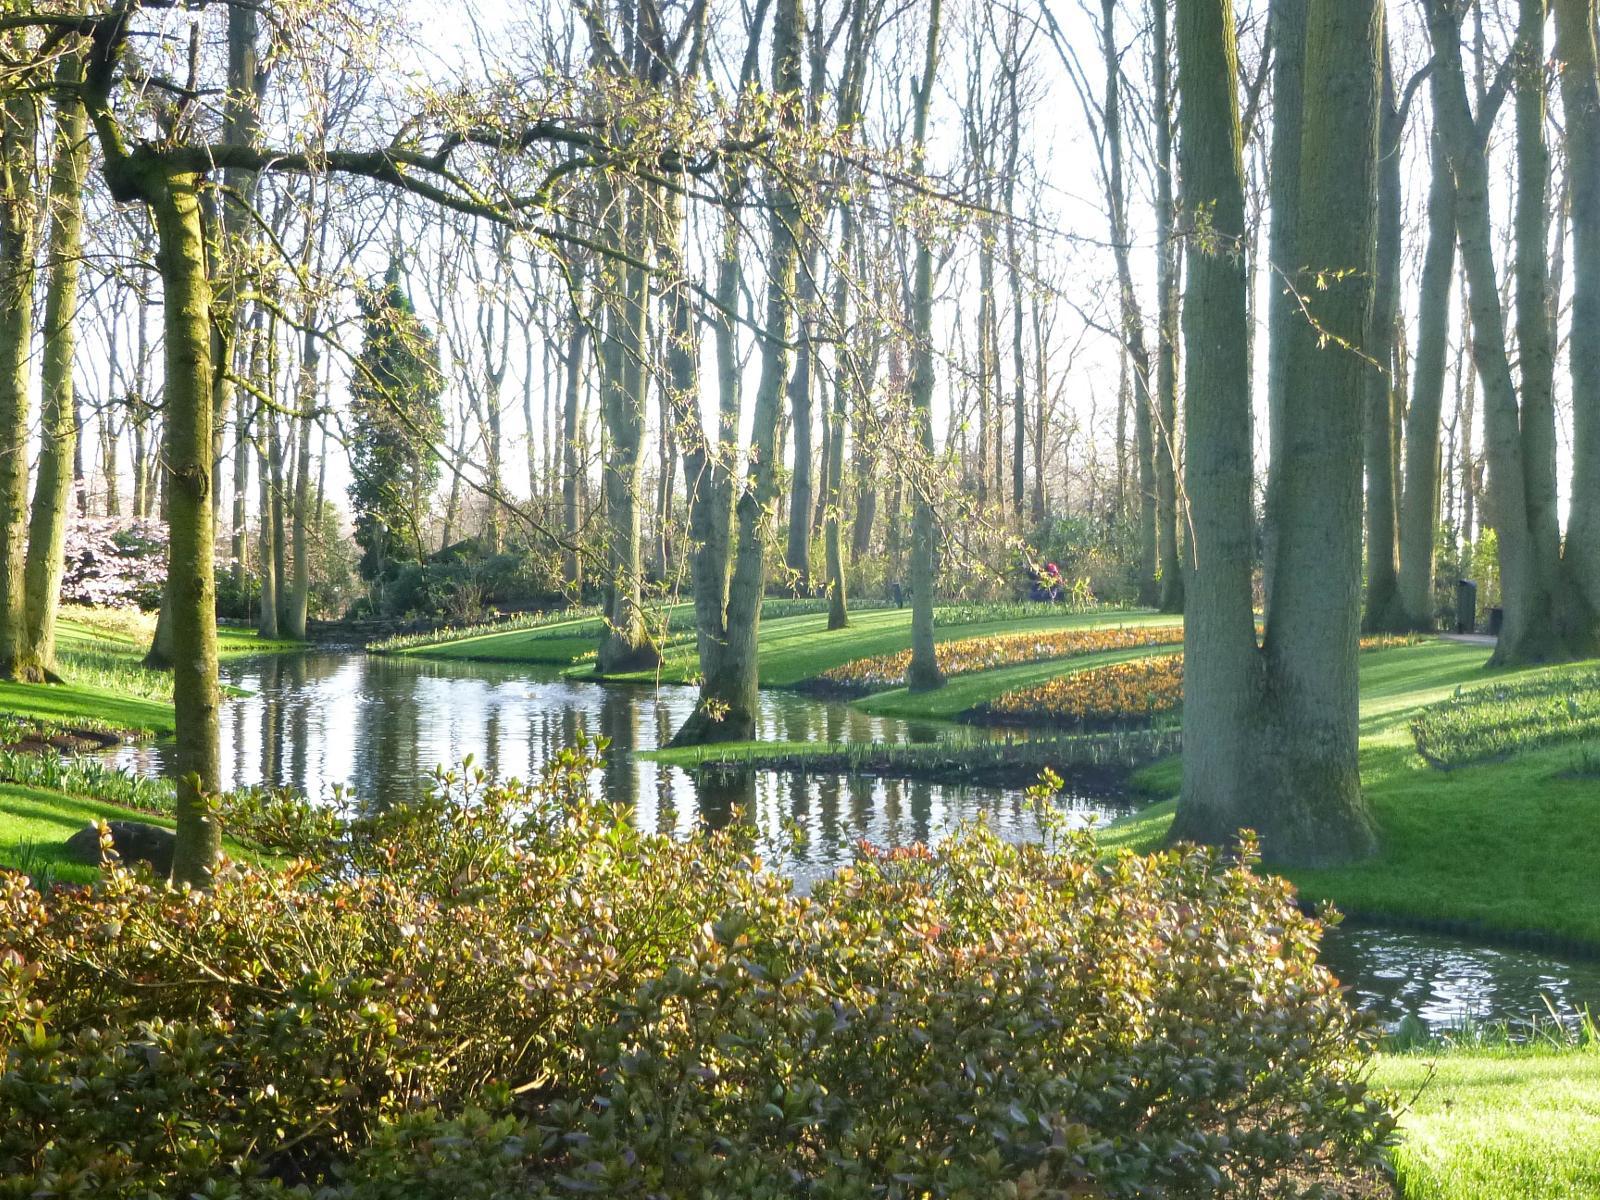 Wikiloc - Photo Of Jardins De Keukenhof (Lisse, Holanda) (1/6) encequiconcerne Jardin De Keukenhof